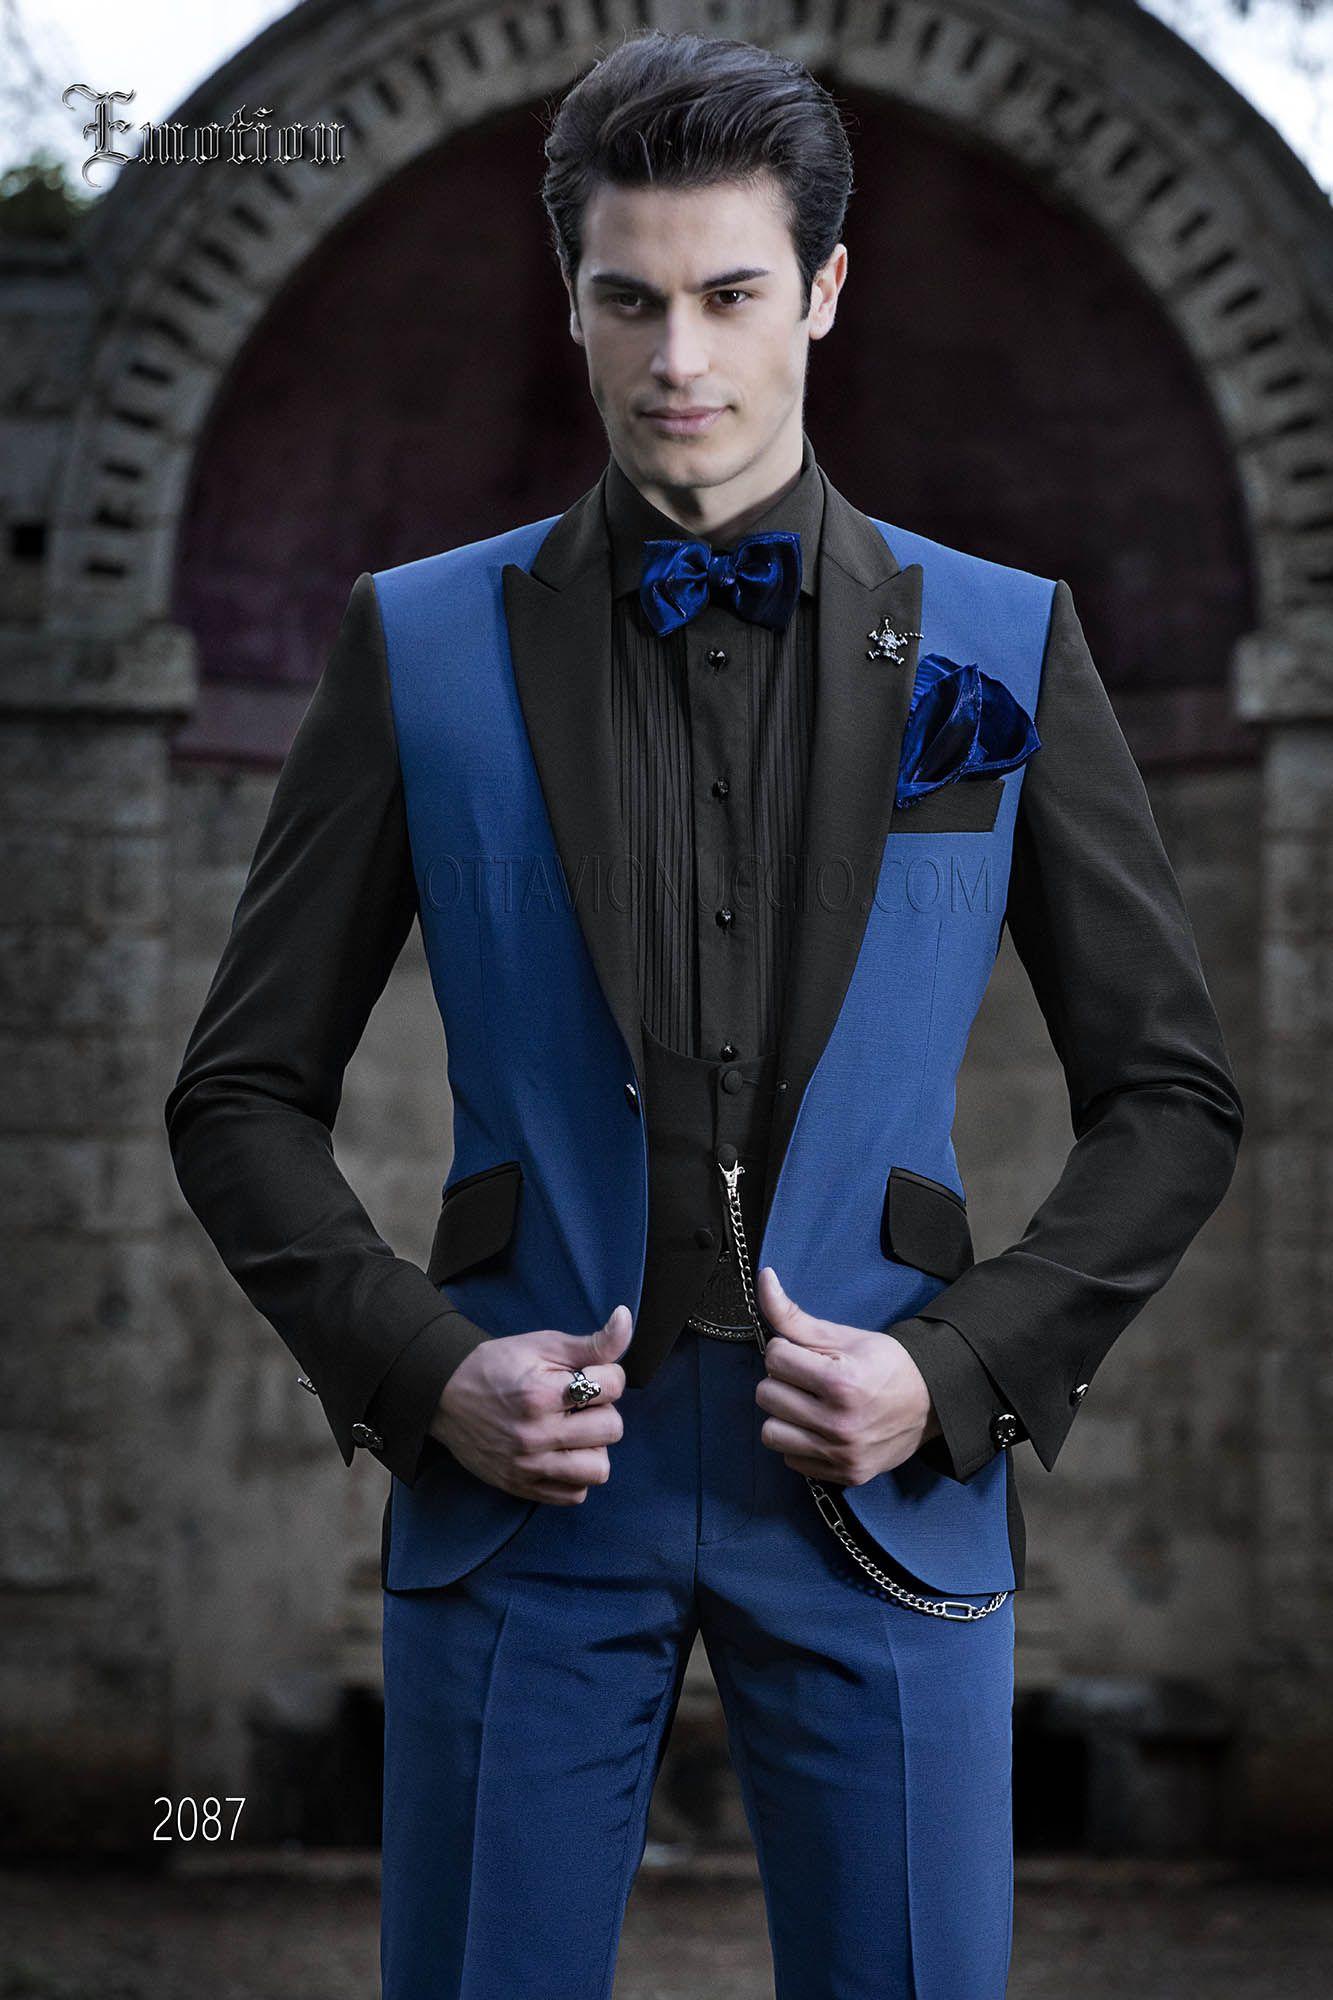 Traje moderno Patchwork azul eléctrico y negro. Conjunto ONGala 2087 ... 10d74939d18